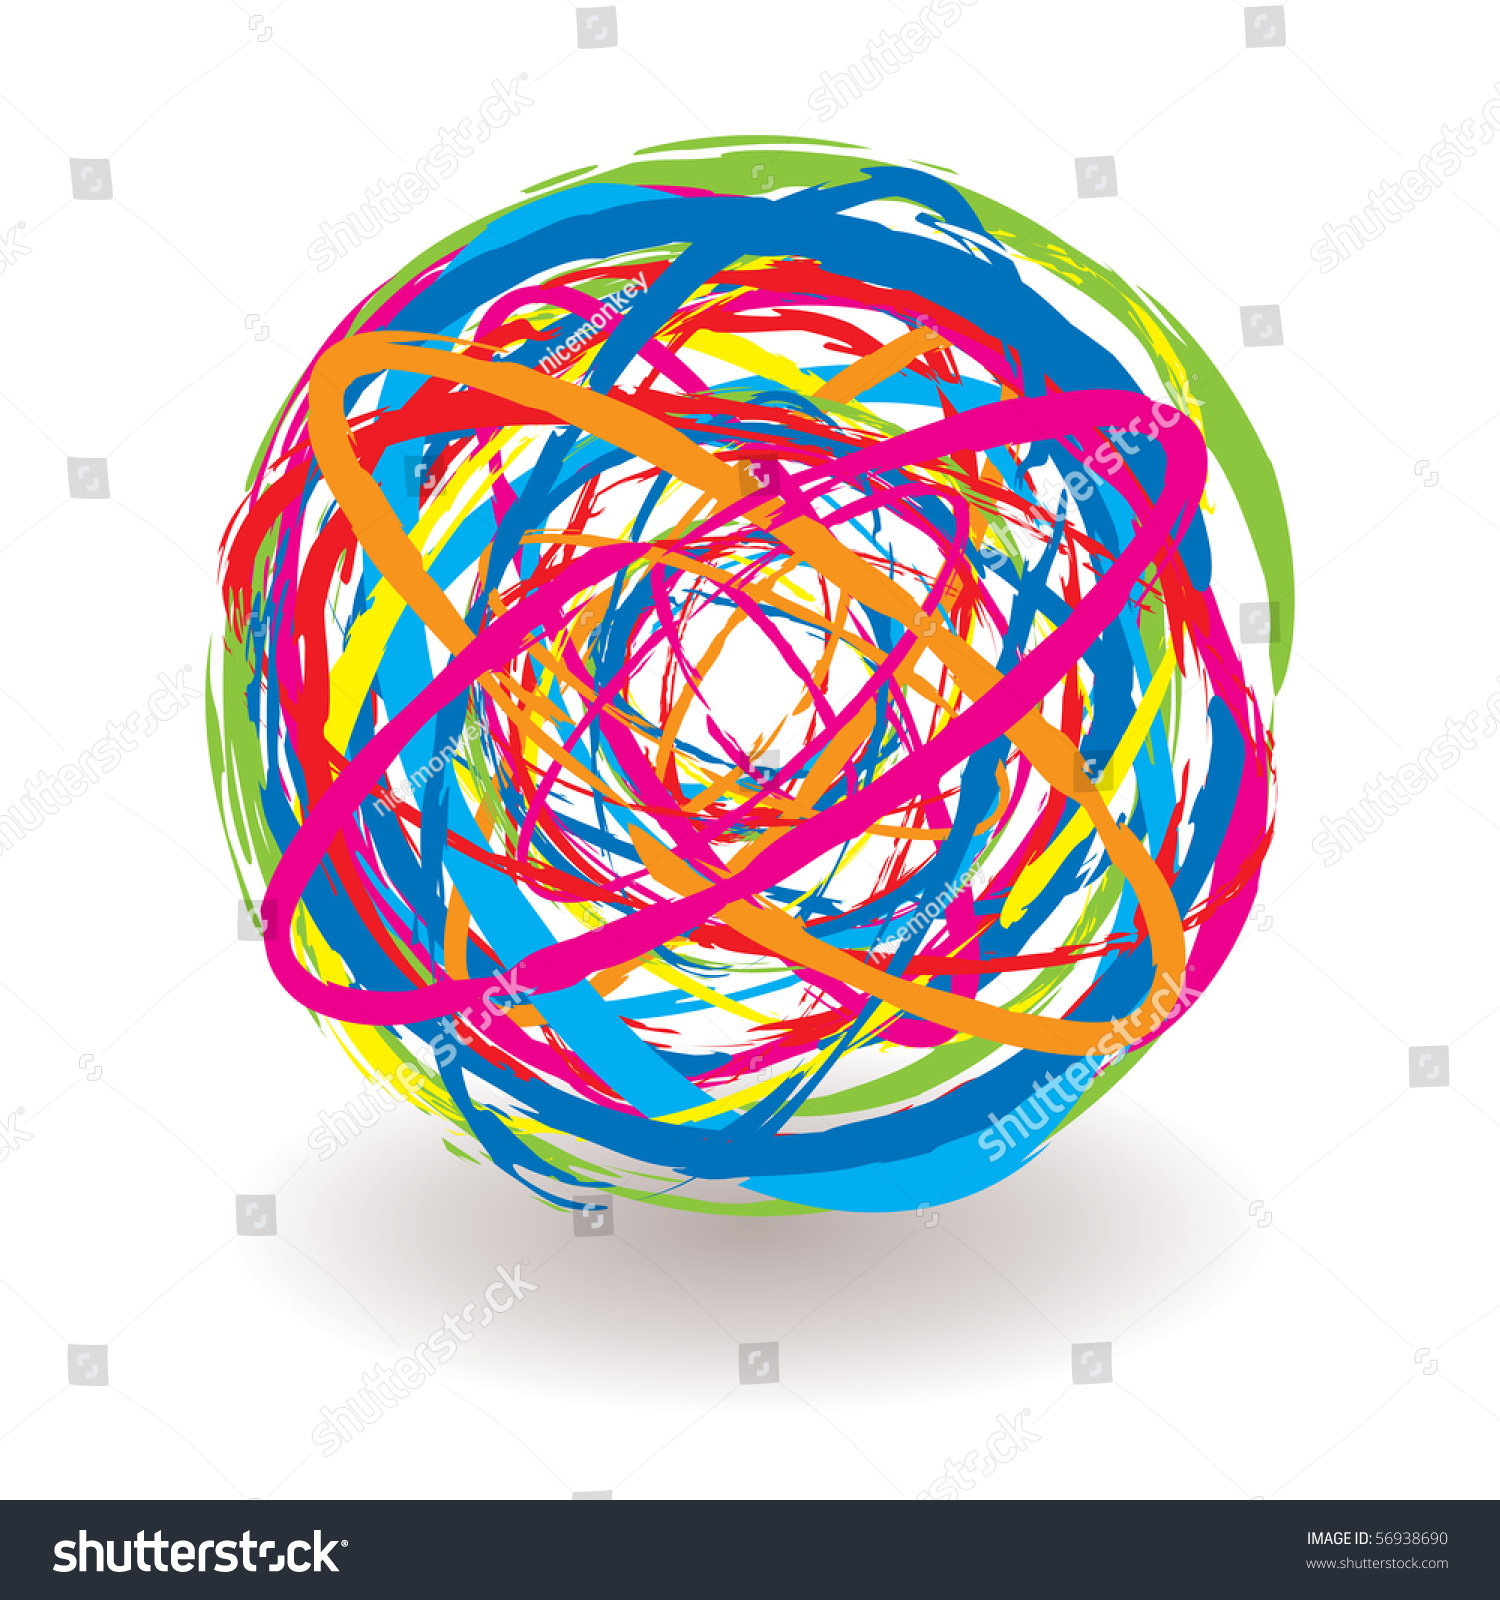 elastic band ball how to make